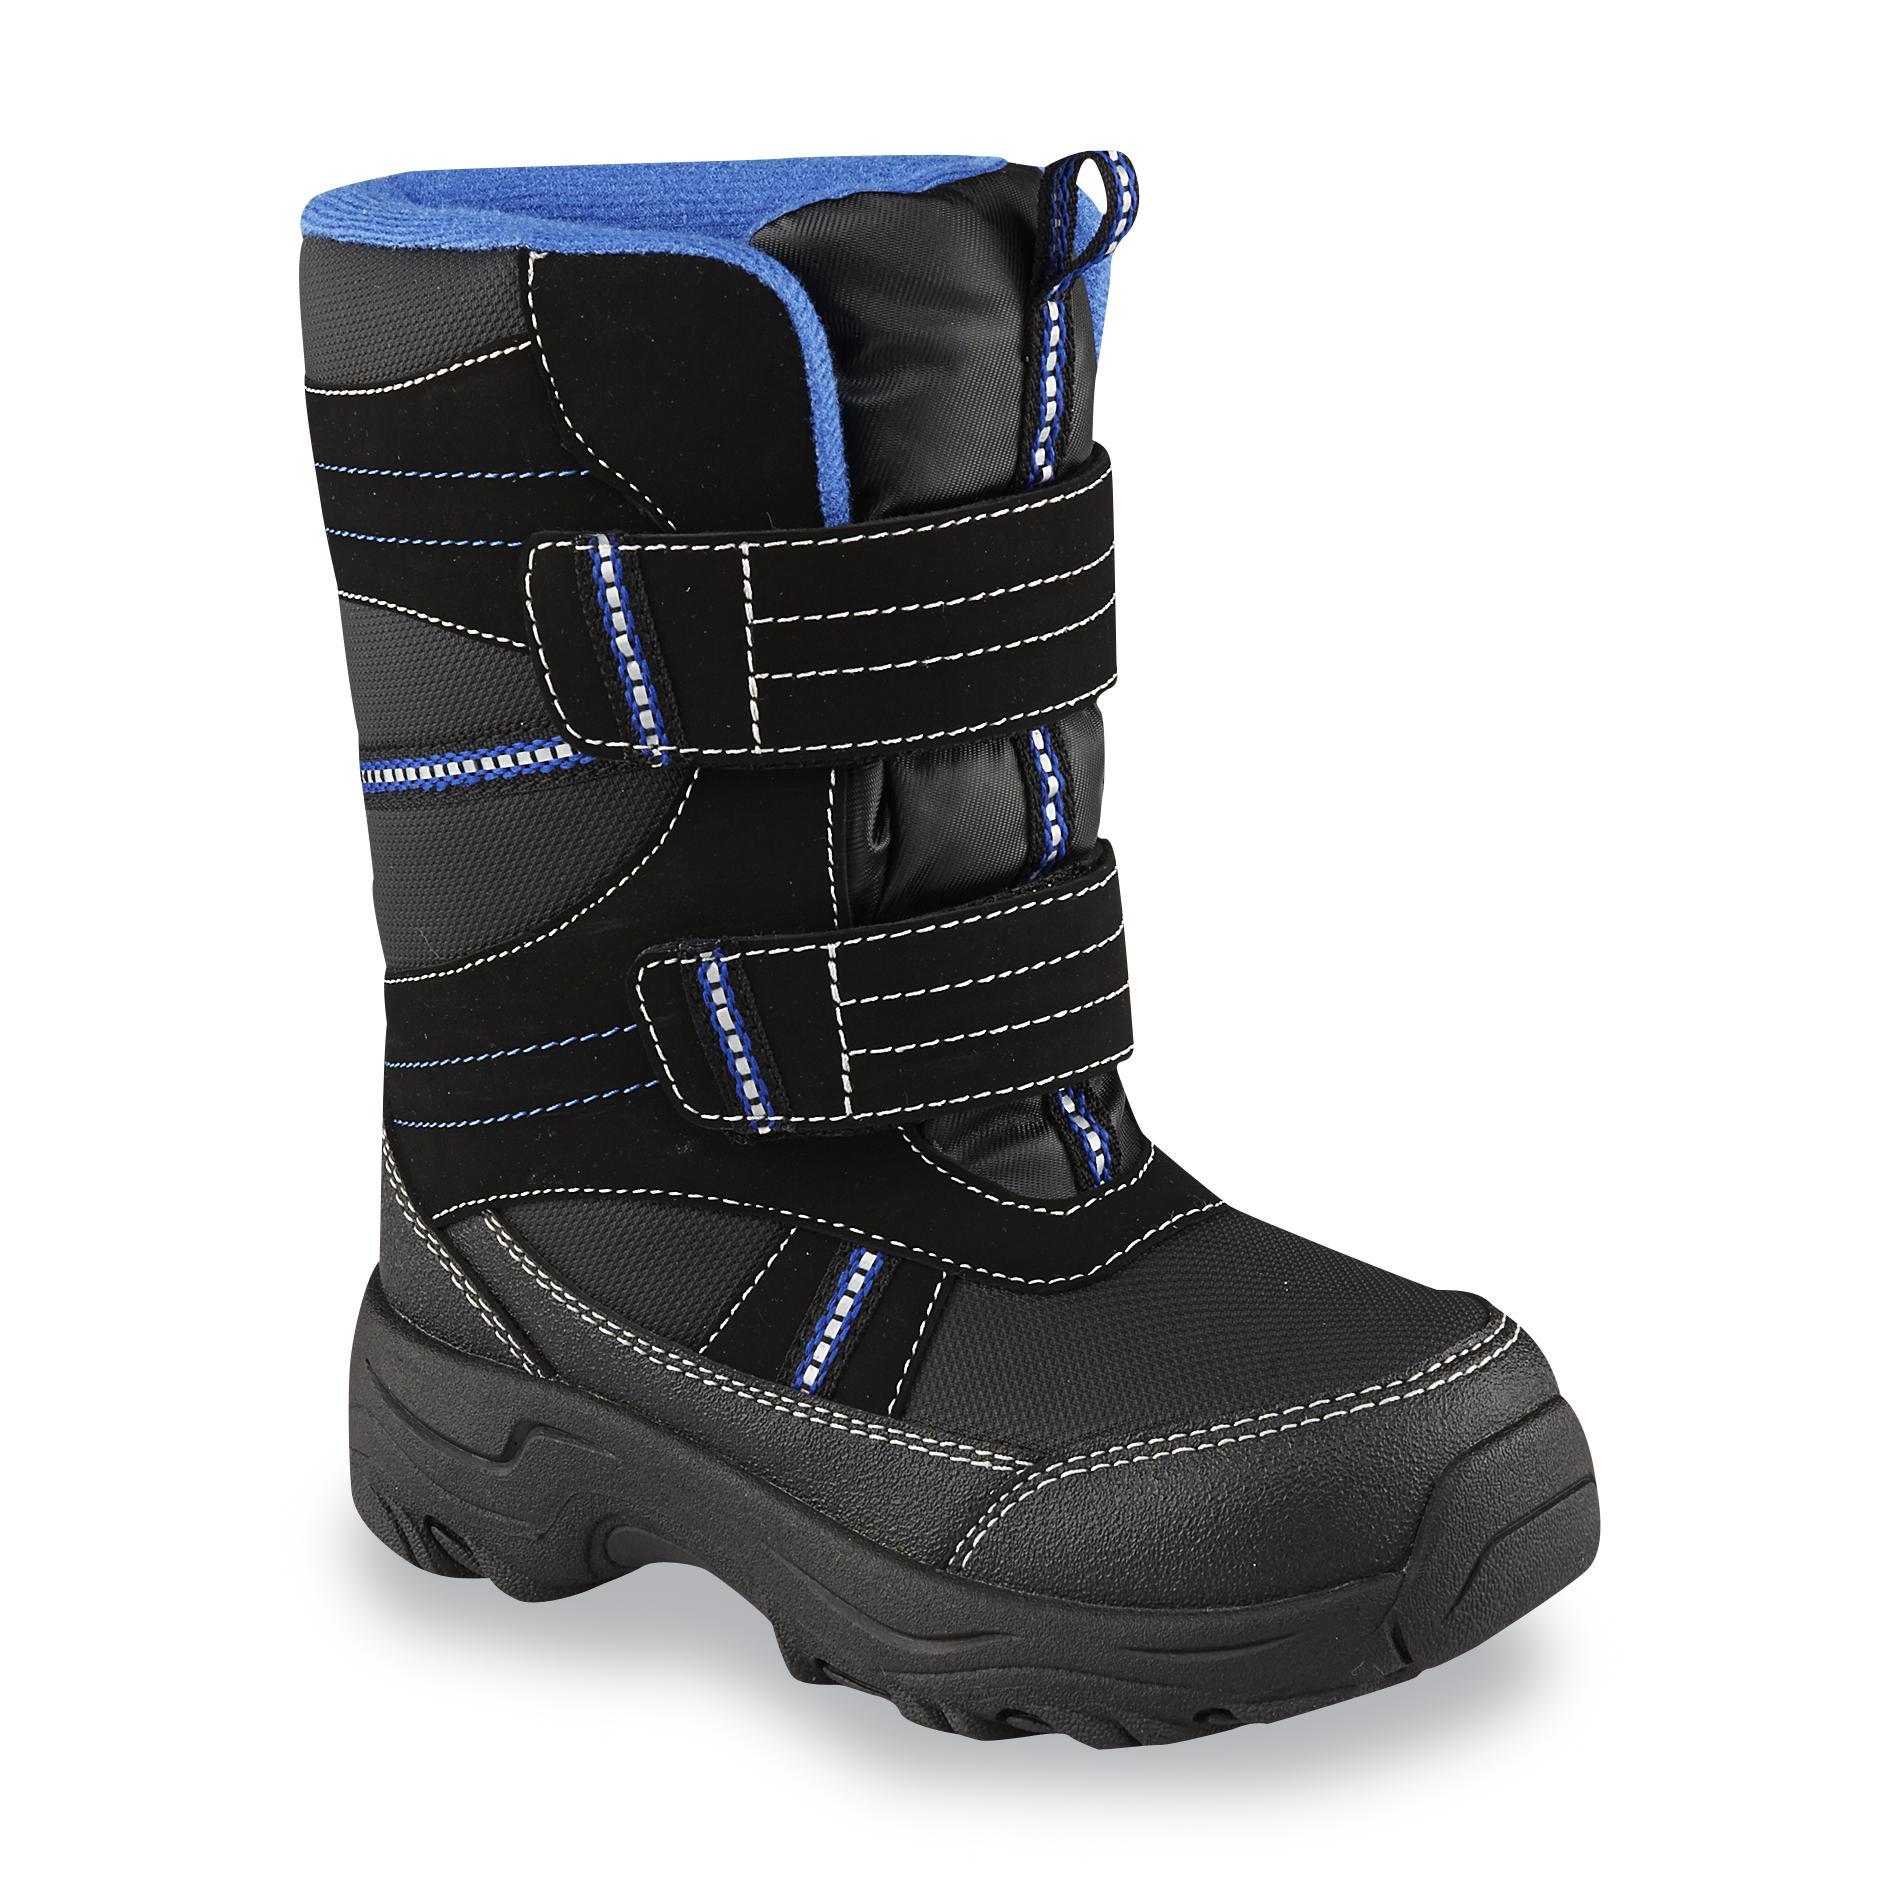 Athletech Boys Nagle Black Waterproof Winter Snow Boot